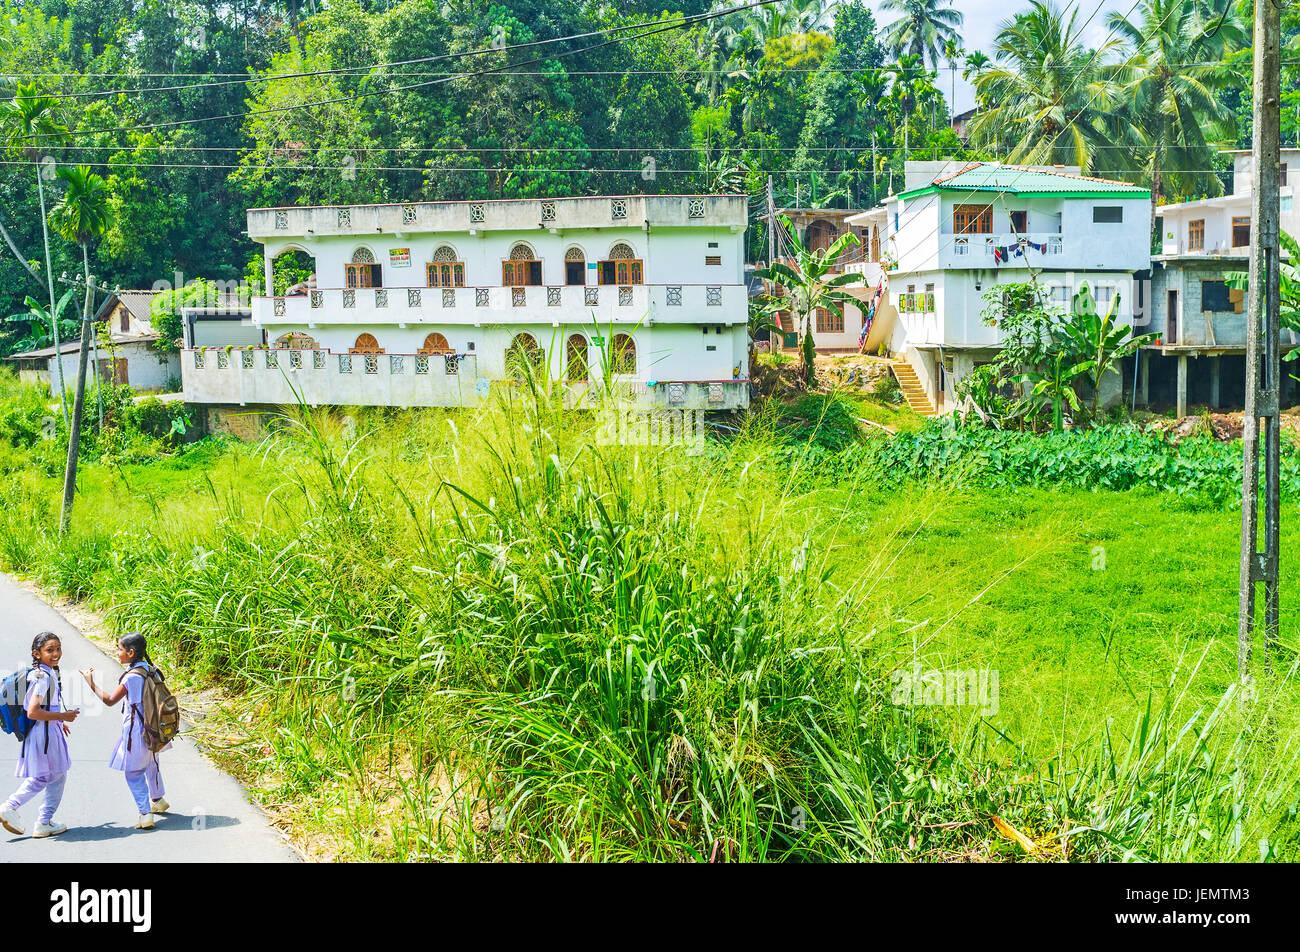 HANDESSA, SRI LANKA - NOVEMBER 29, 2016: The schoolgirls play in the village street on the way home, along the farm - Stock Image